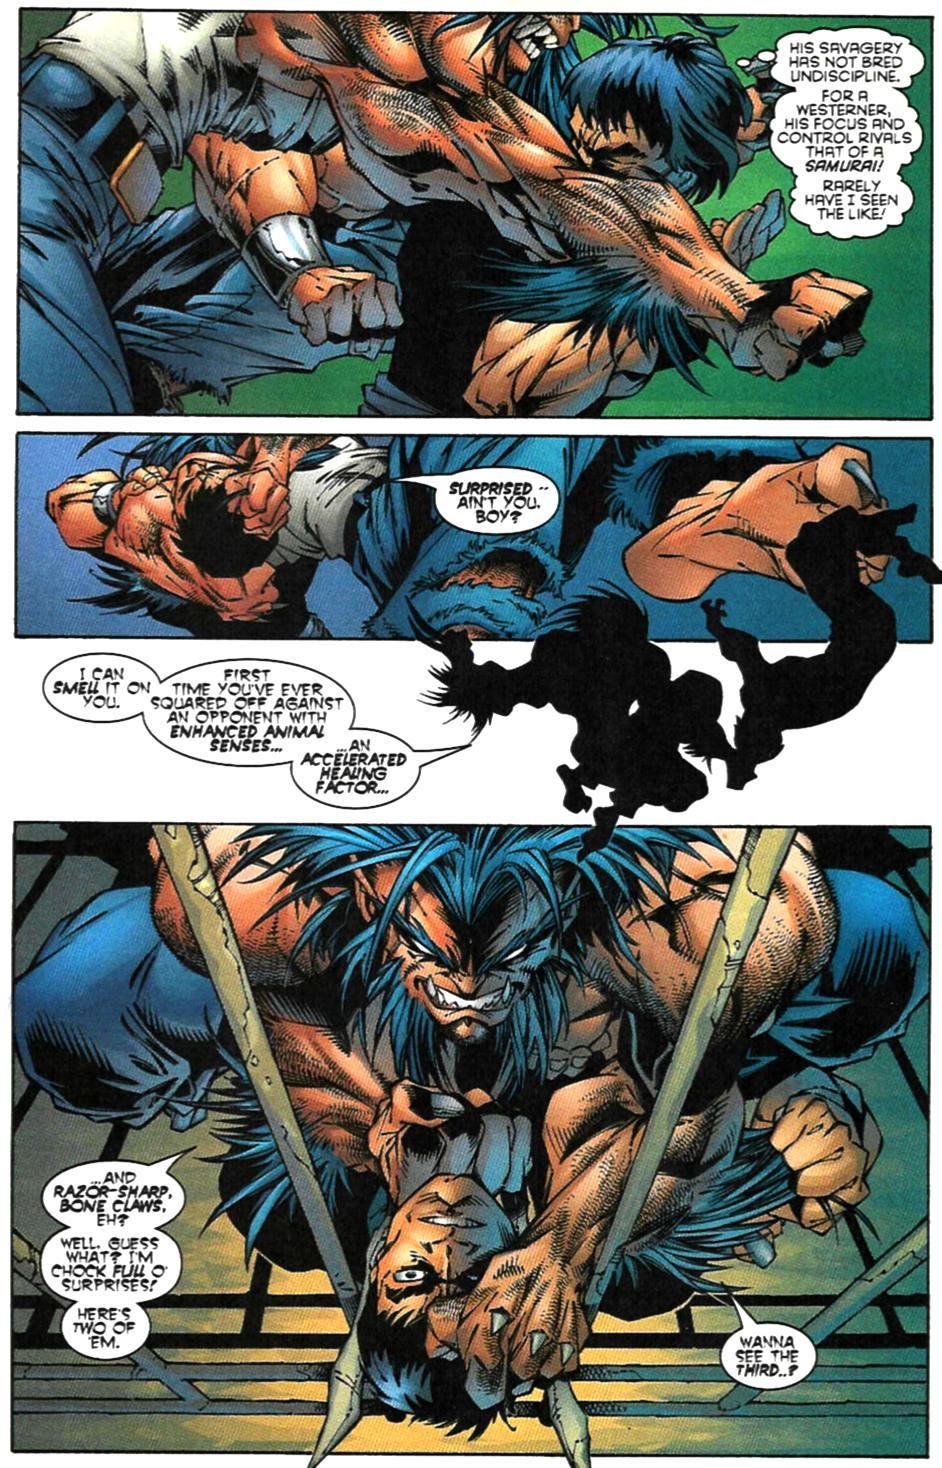 X-Men (1991) 62 Page 9